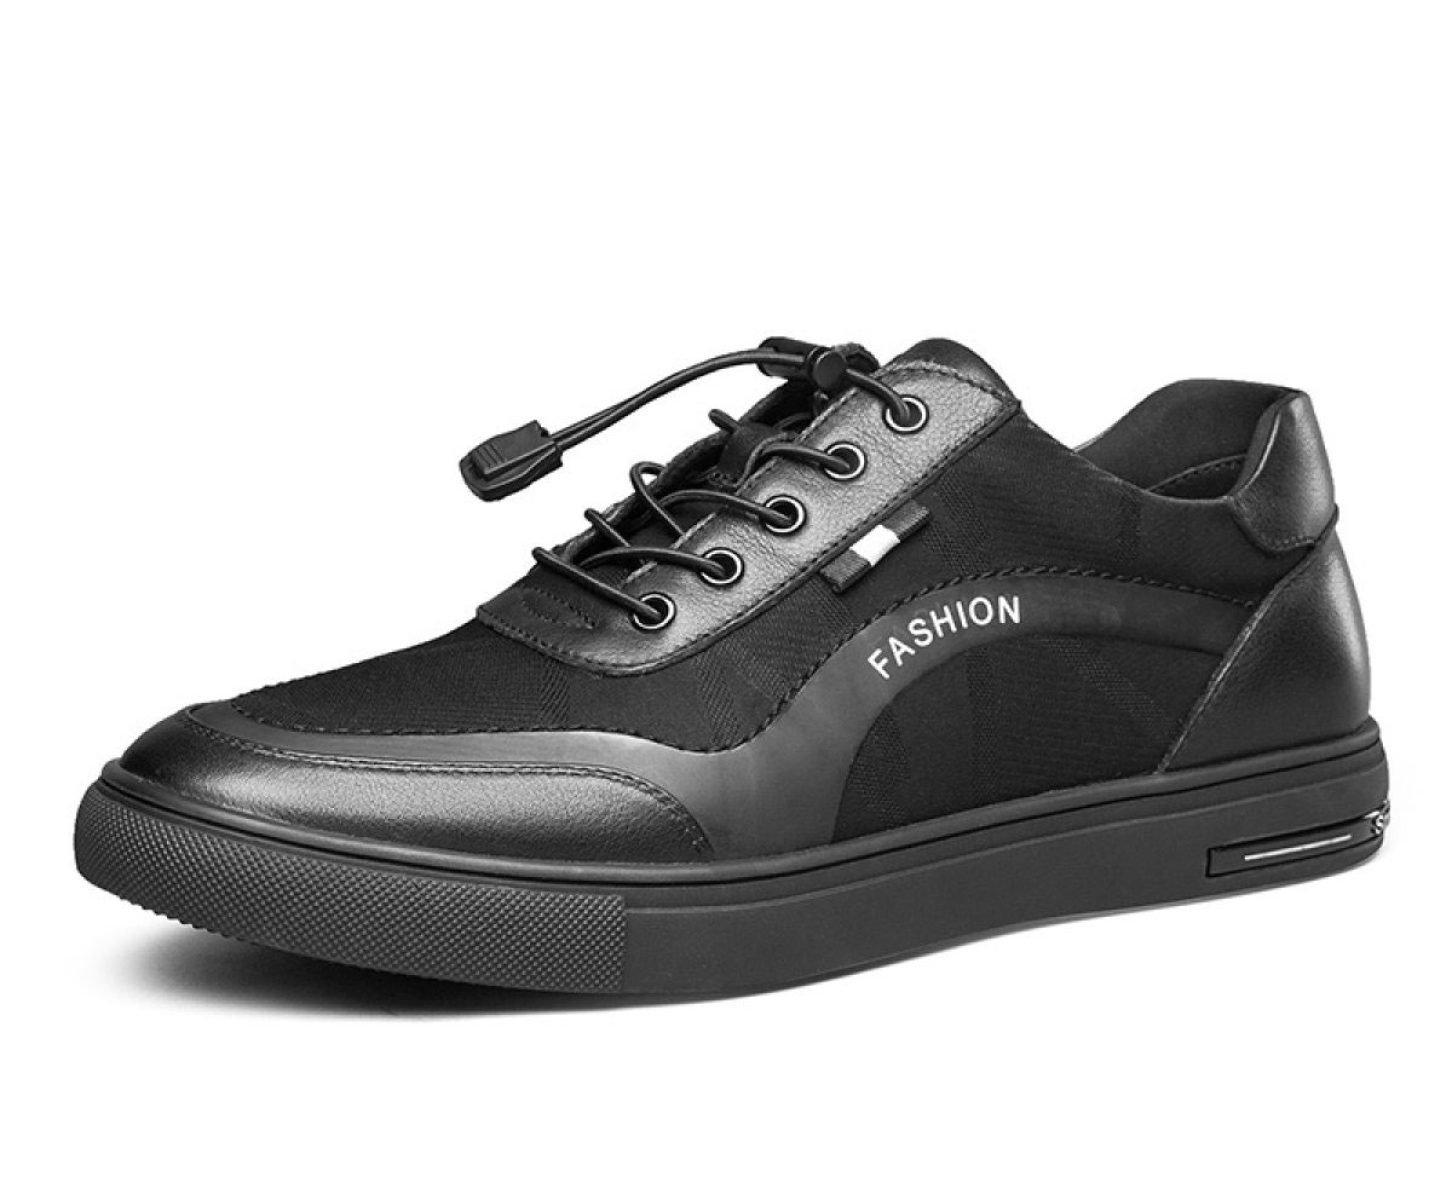 MUYII Herren Lederschuhe Für Männer Plain Toe Leder Loafer Klassische Casual Sport Mens Rutschfeste Bequeme Schuhe